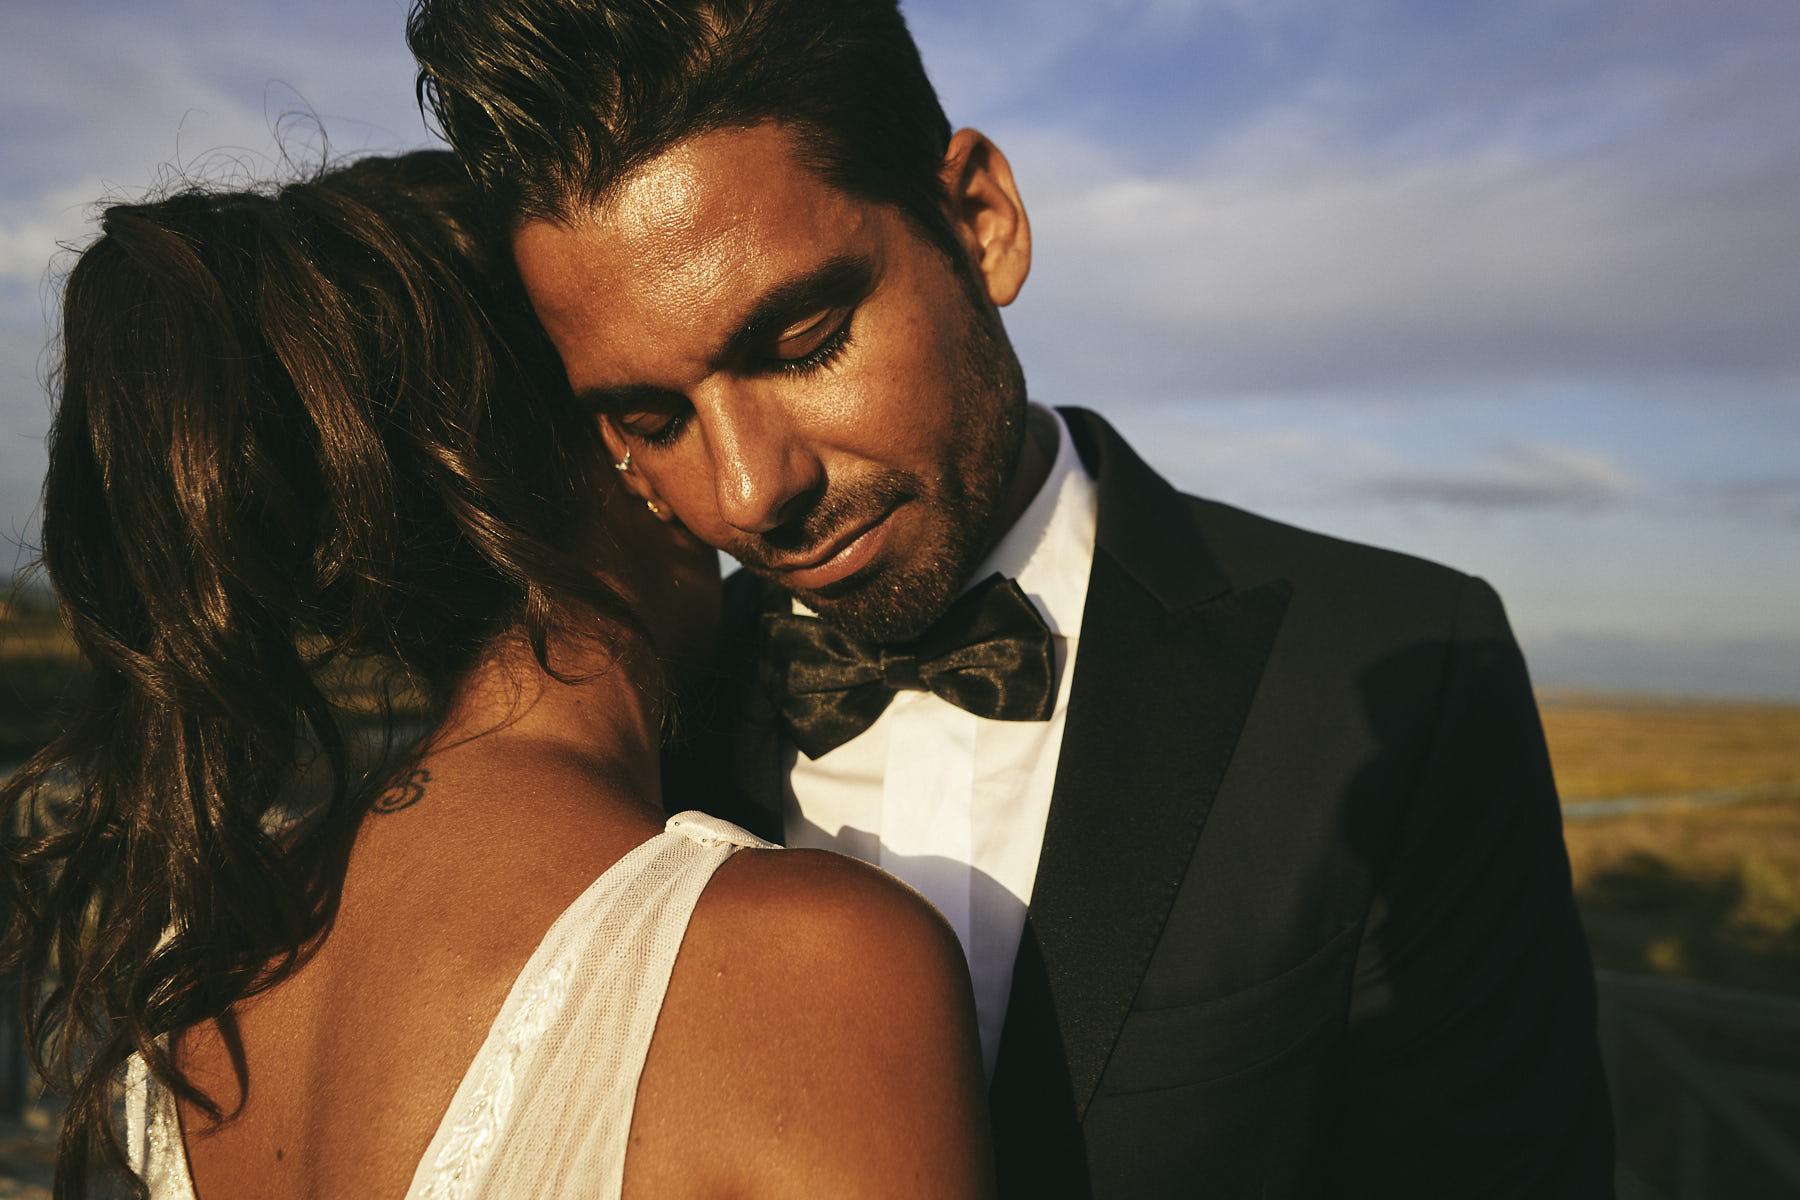 wedding_tuscany_maremma_20_frank_catucci wedding_tuscany_maremma_21_frank_catucci